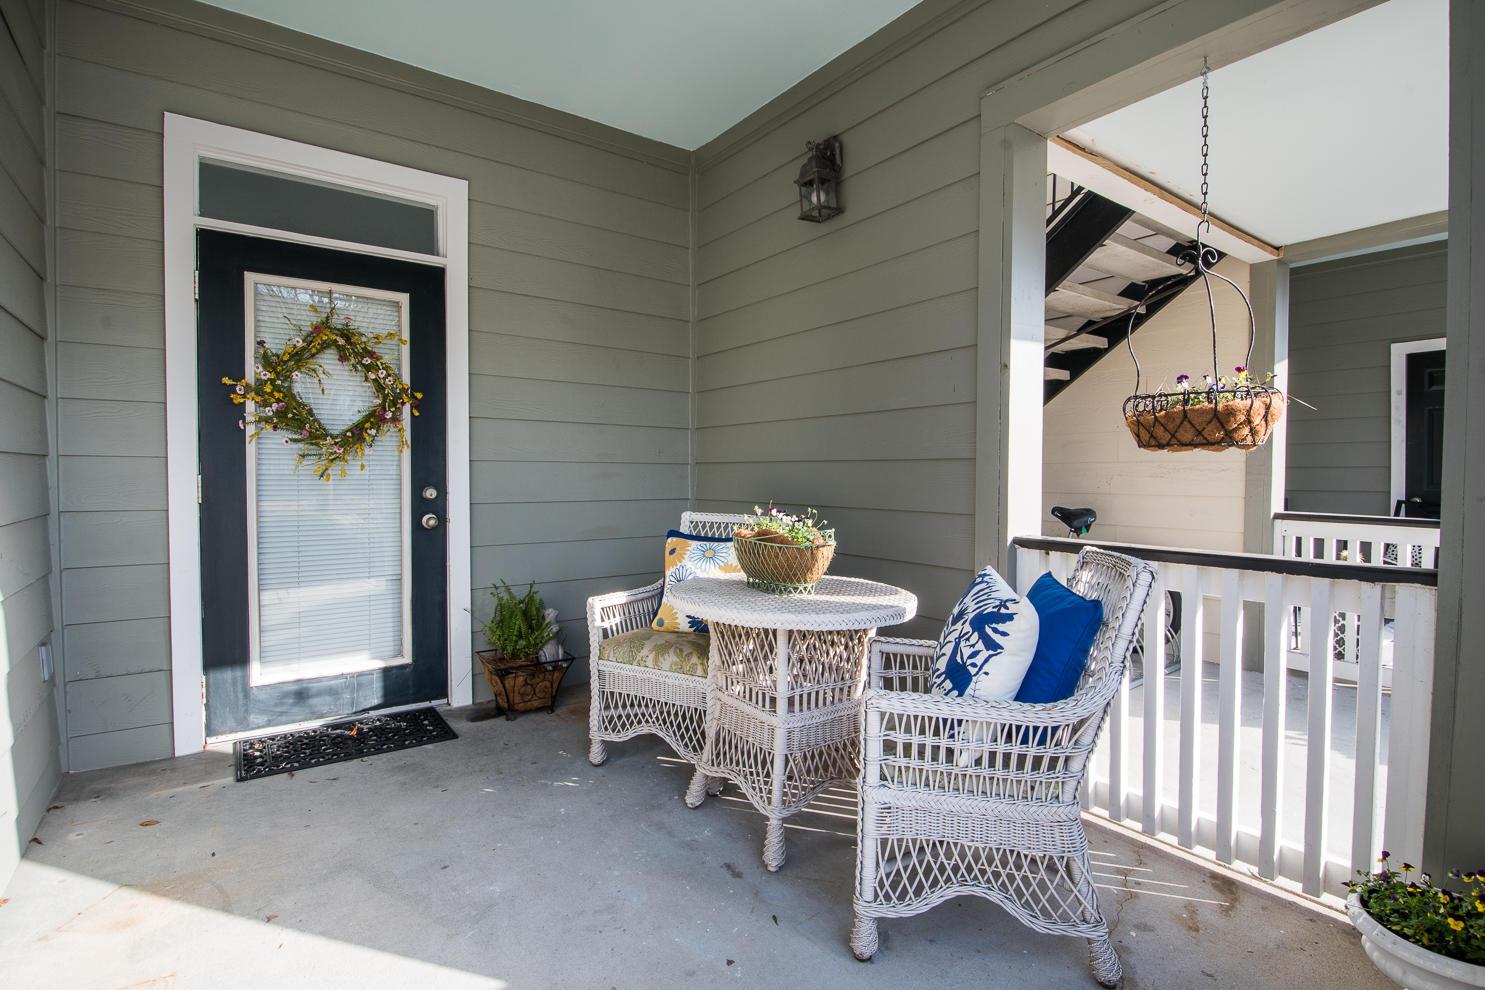 Daniel Landing Condos Homes For Sale - 130 River Landing, Charleston, SC - 30